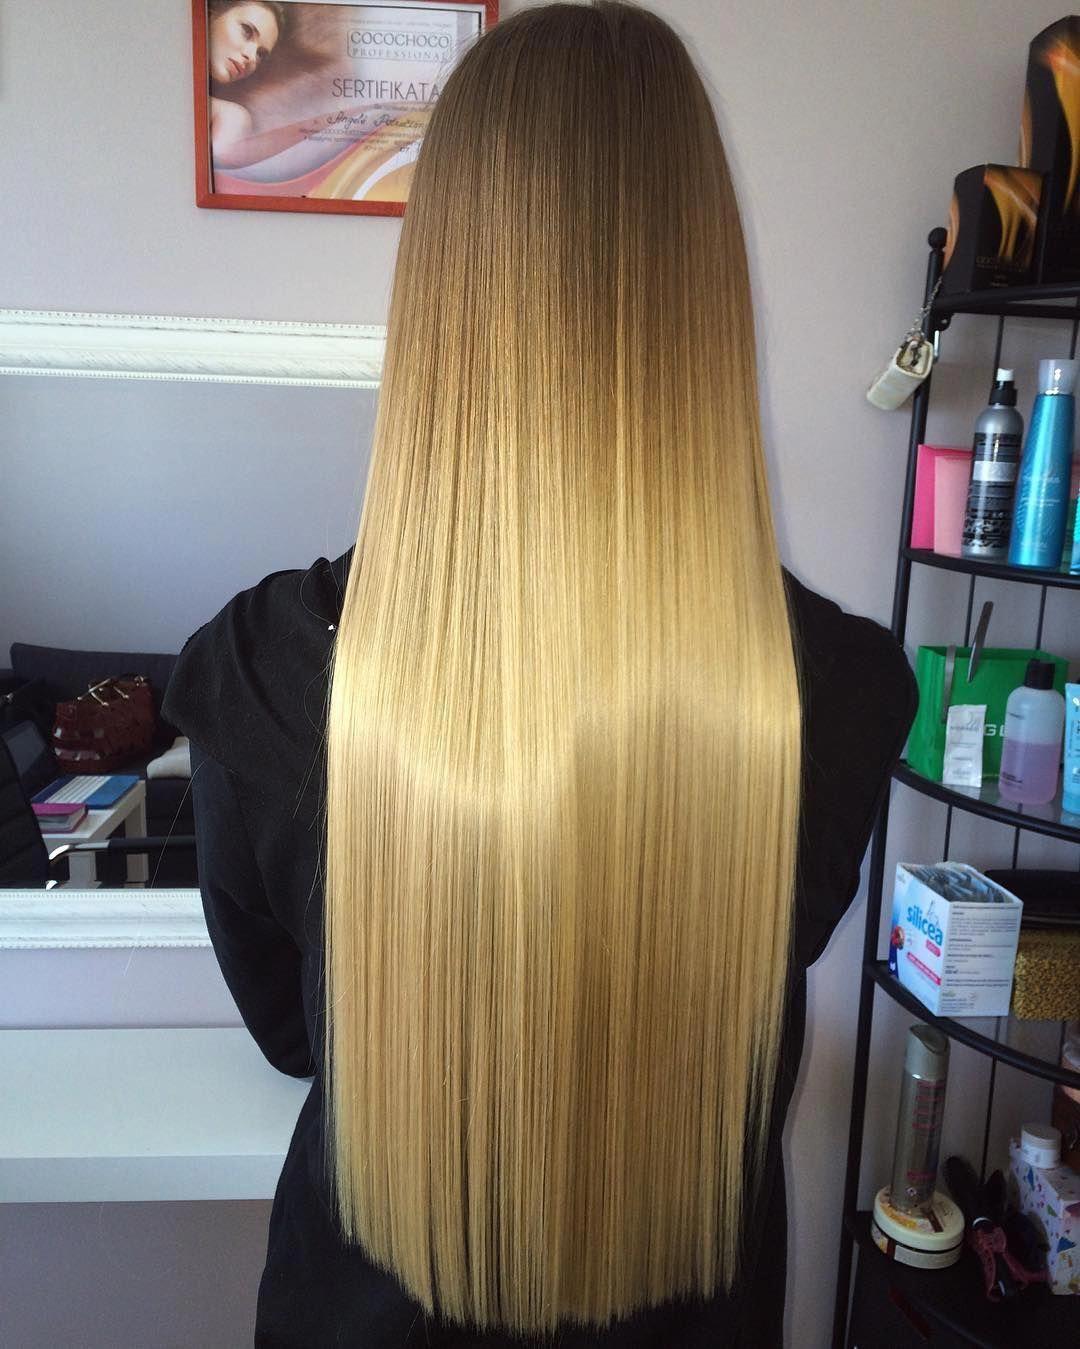 Black Straight Hairstyles Cute Straight Hair Haircuts For Super Straight Hair 20190429 Long Hair Styles Hair Styles Long Blonde Hair